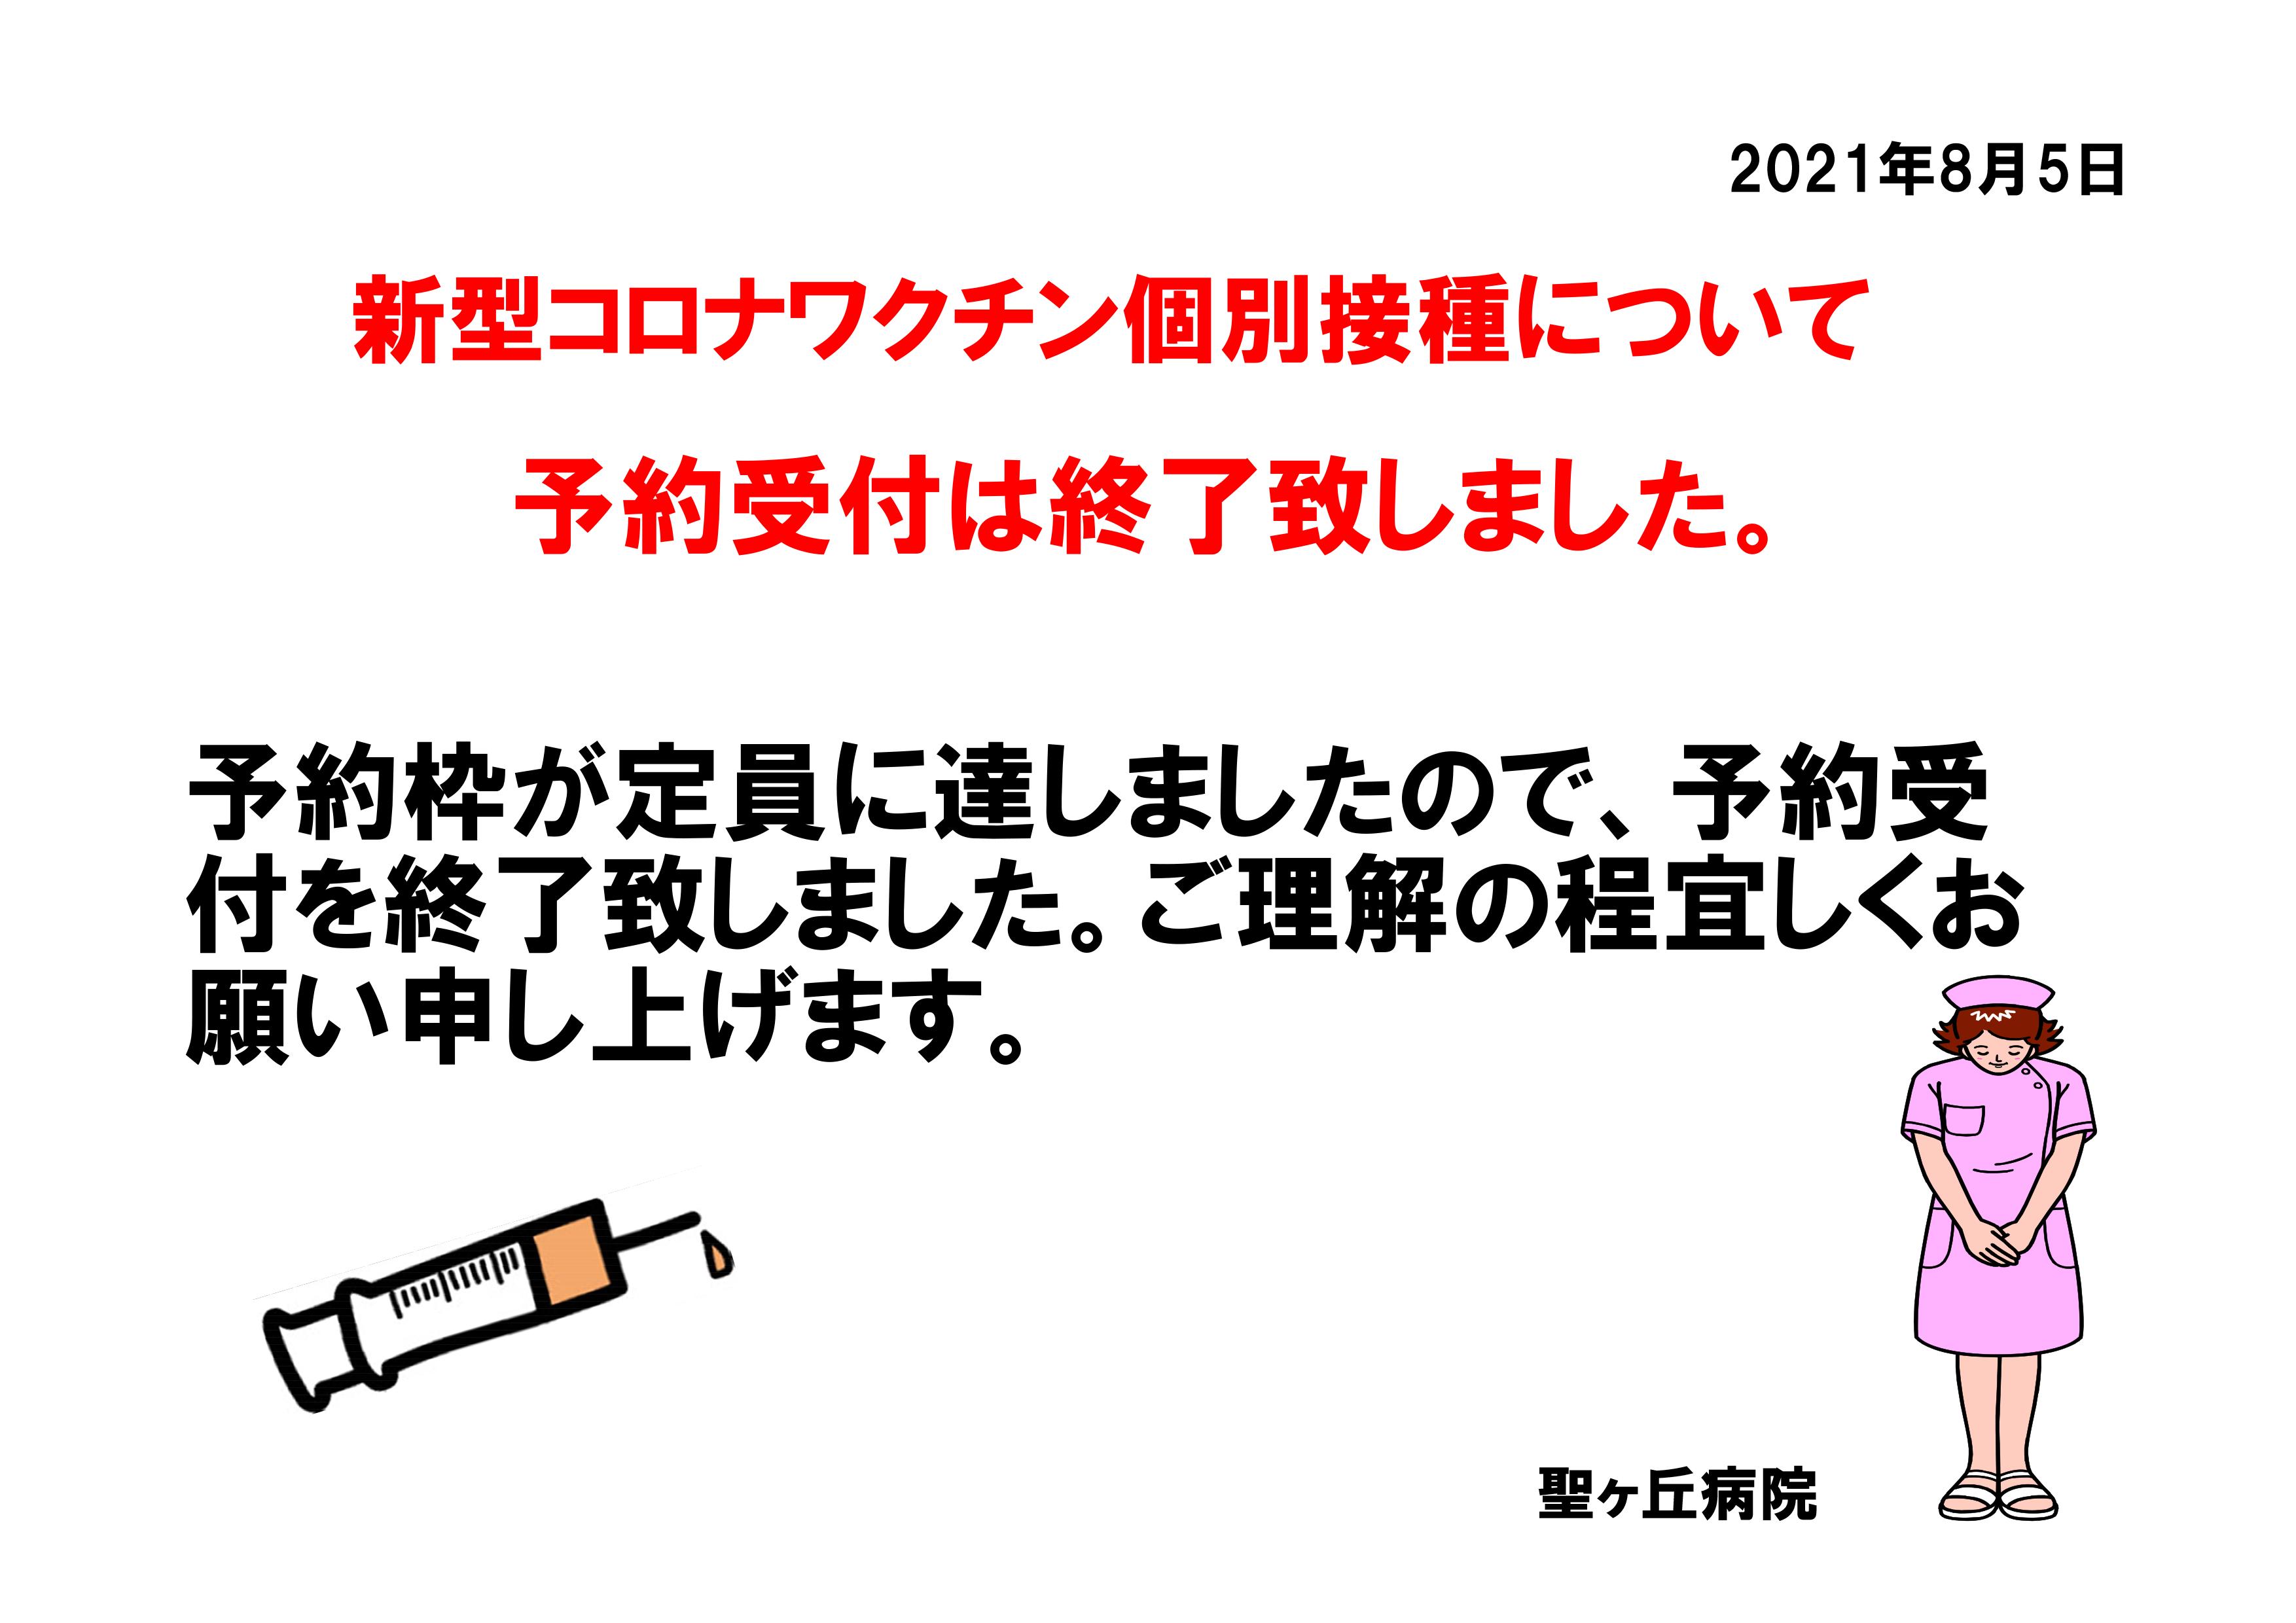 20210805_vaccination